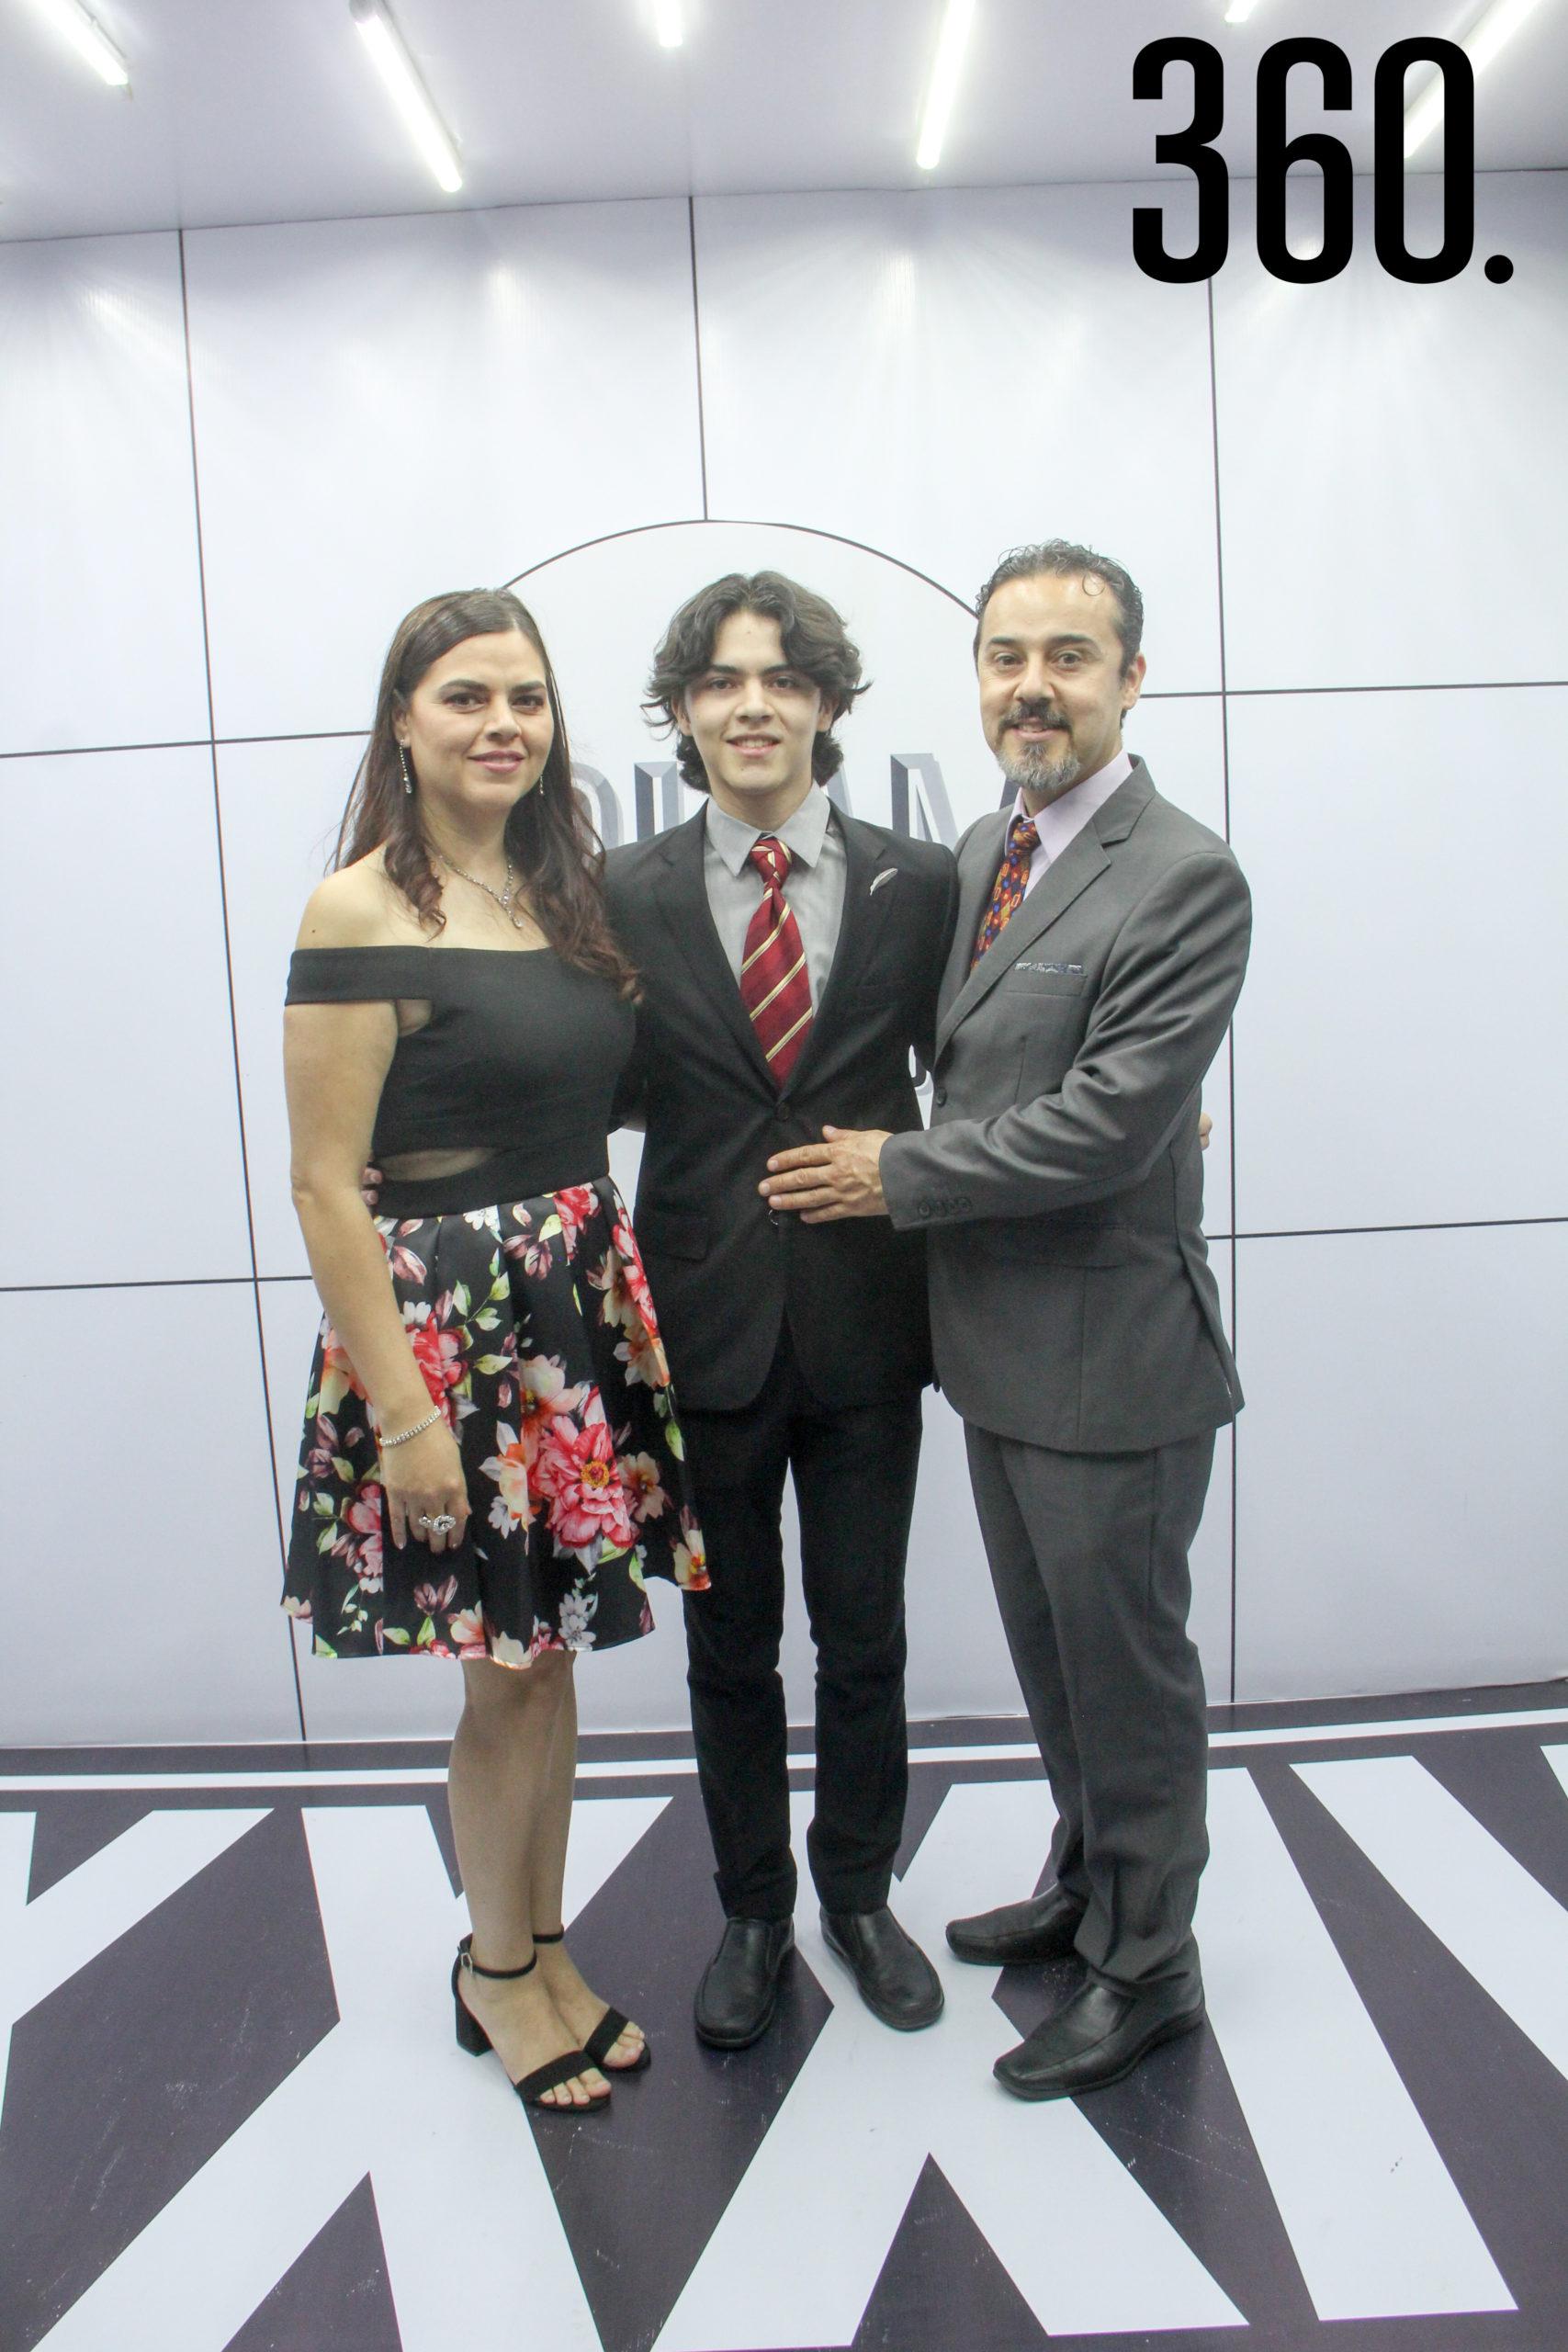 Mónica de Moreno, Daniel Moreno y Daniel Moreno.